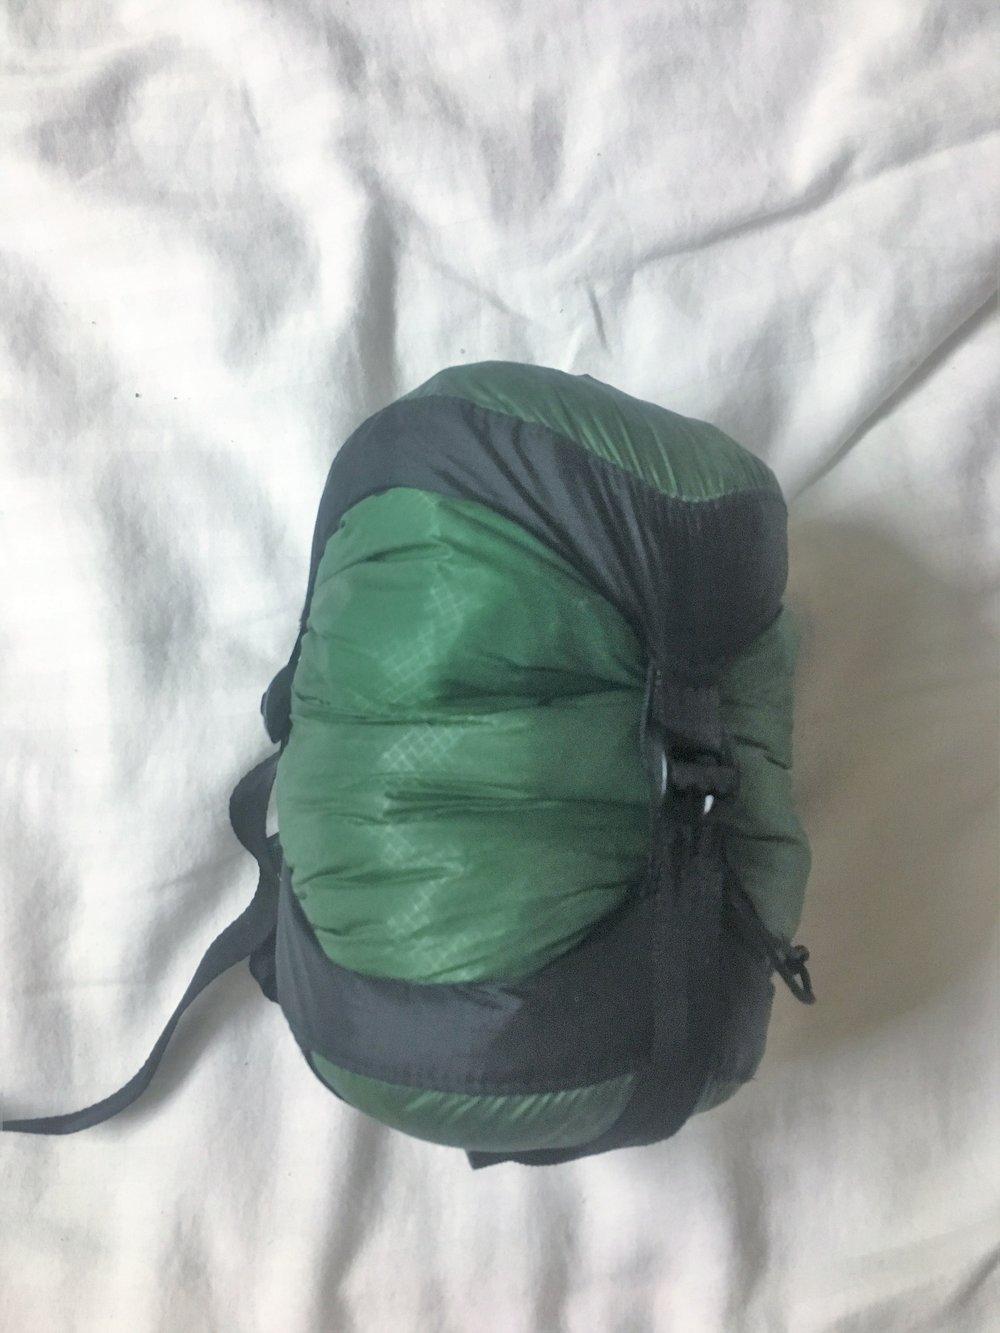 All packed up into a tiiiiinnnyyyy bundle